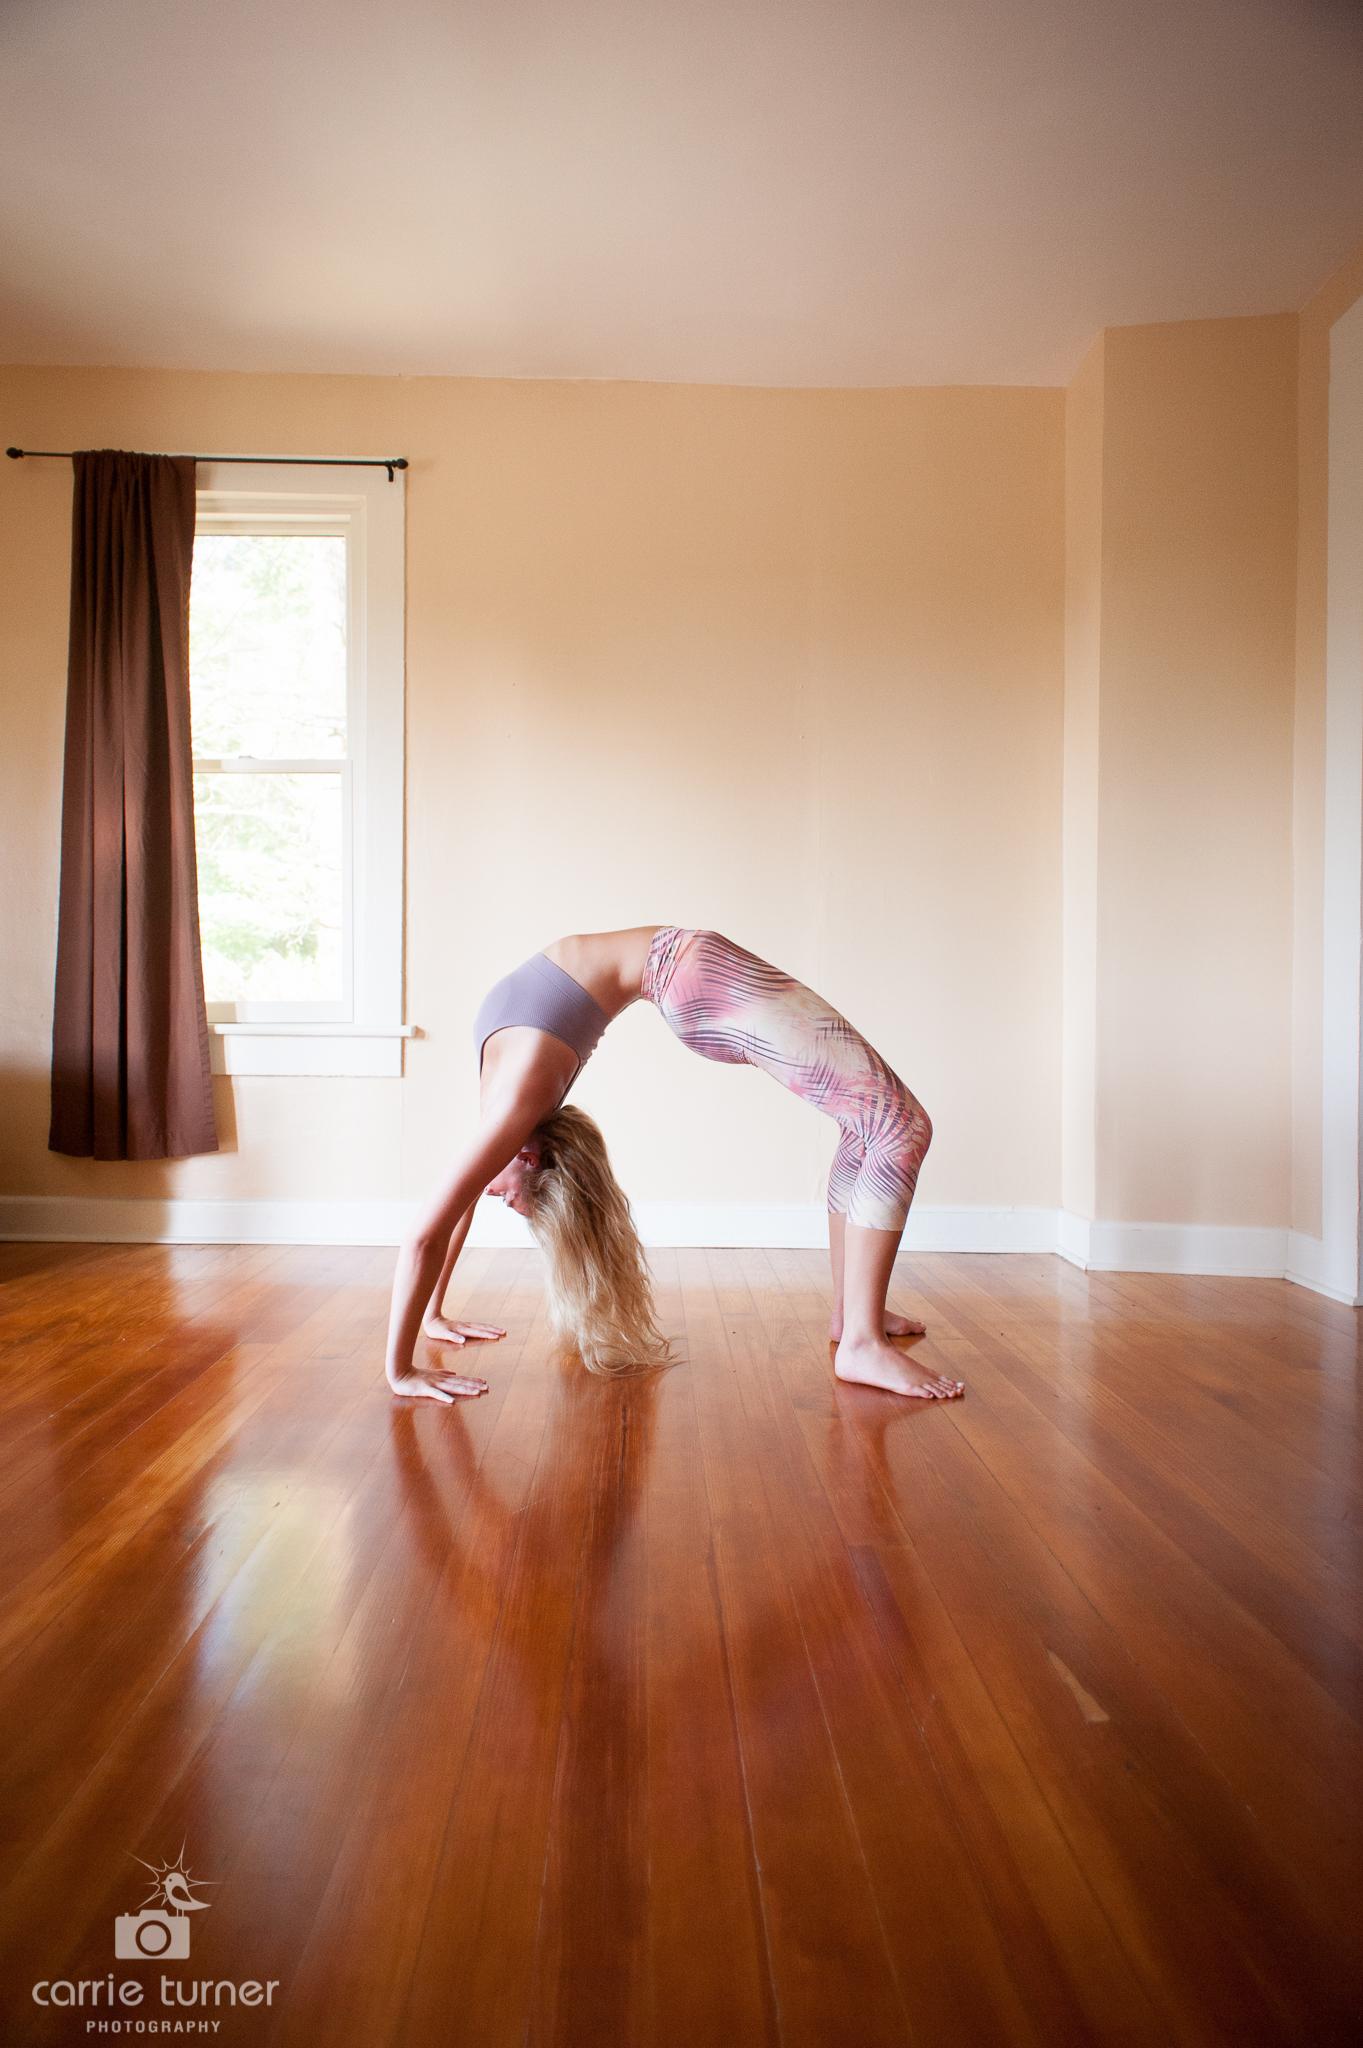 Maggie_yoga and portraits-62.jpg